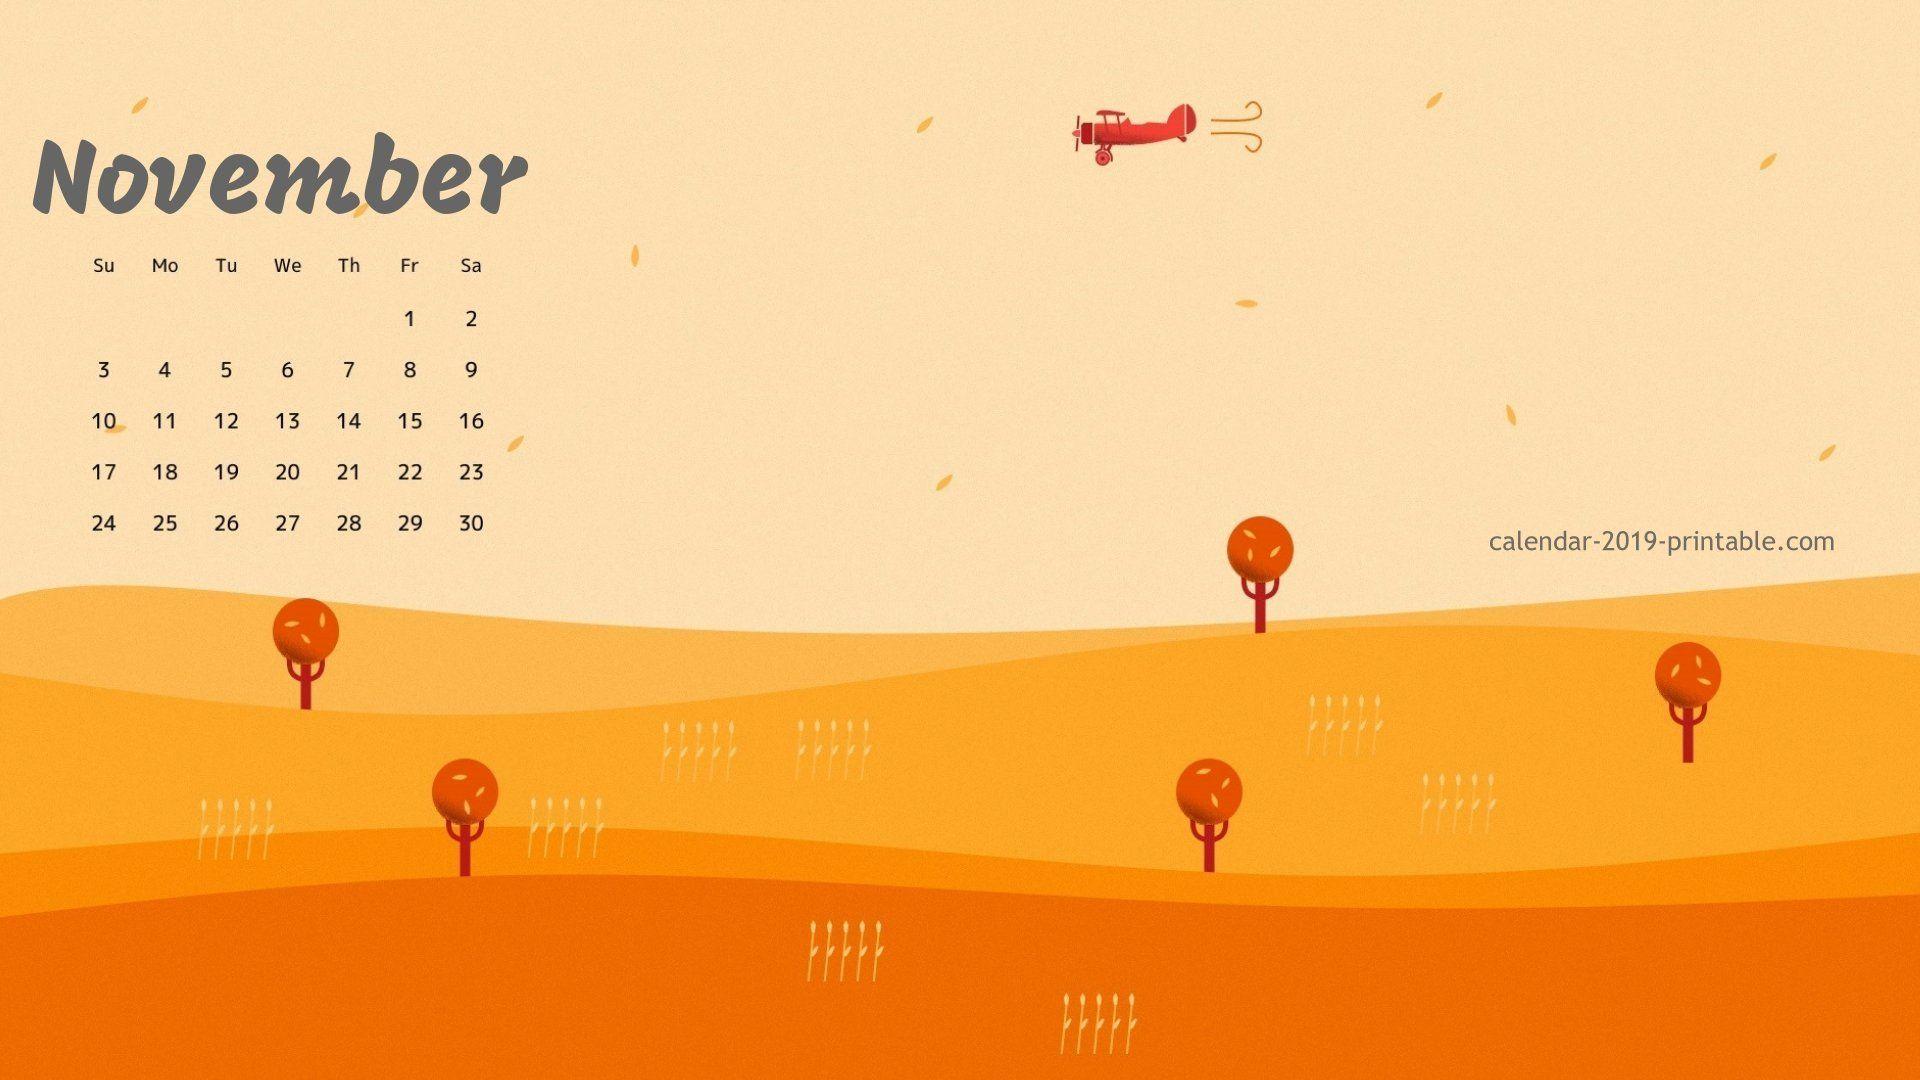 November 2019 Amazing Calendar Wallpaper Calendar 2019